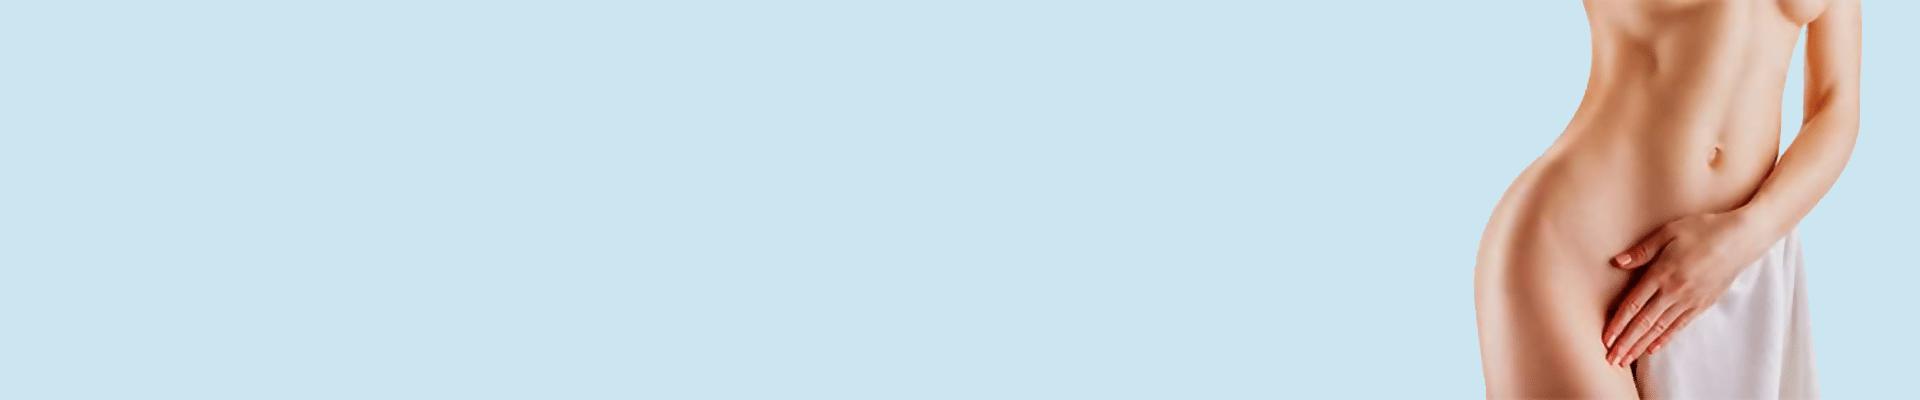 [:fr]Chirurgie Intime Femmes Nabeul : chirurgie réparatrice et esthétique[:ar]جراحة الأعضاء التناسلية للمرأة في نابل : الجراحة التصحيحية والتجميلية[:]